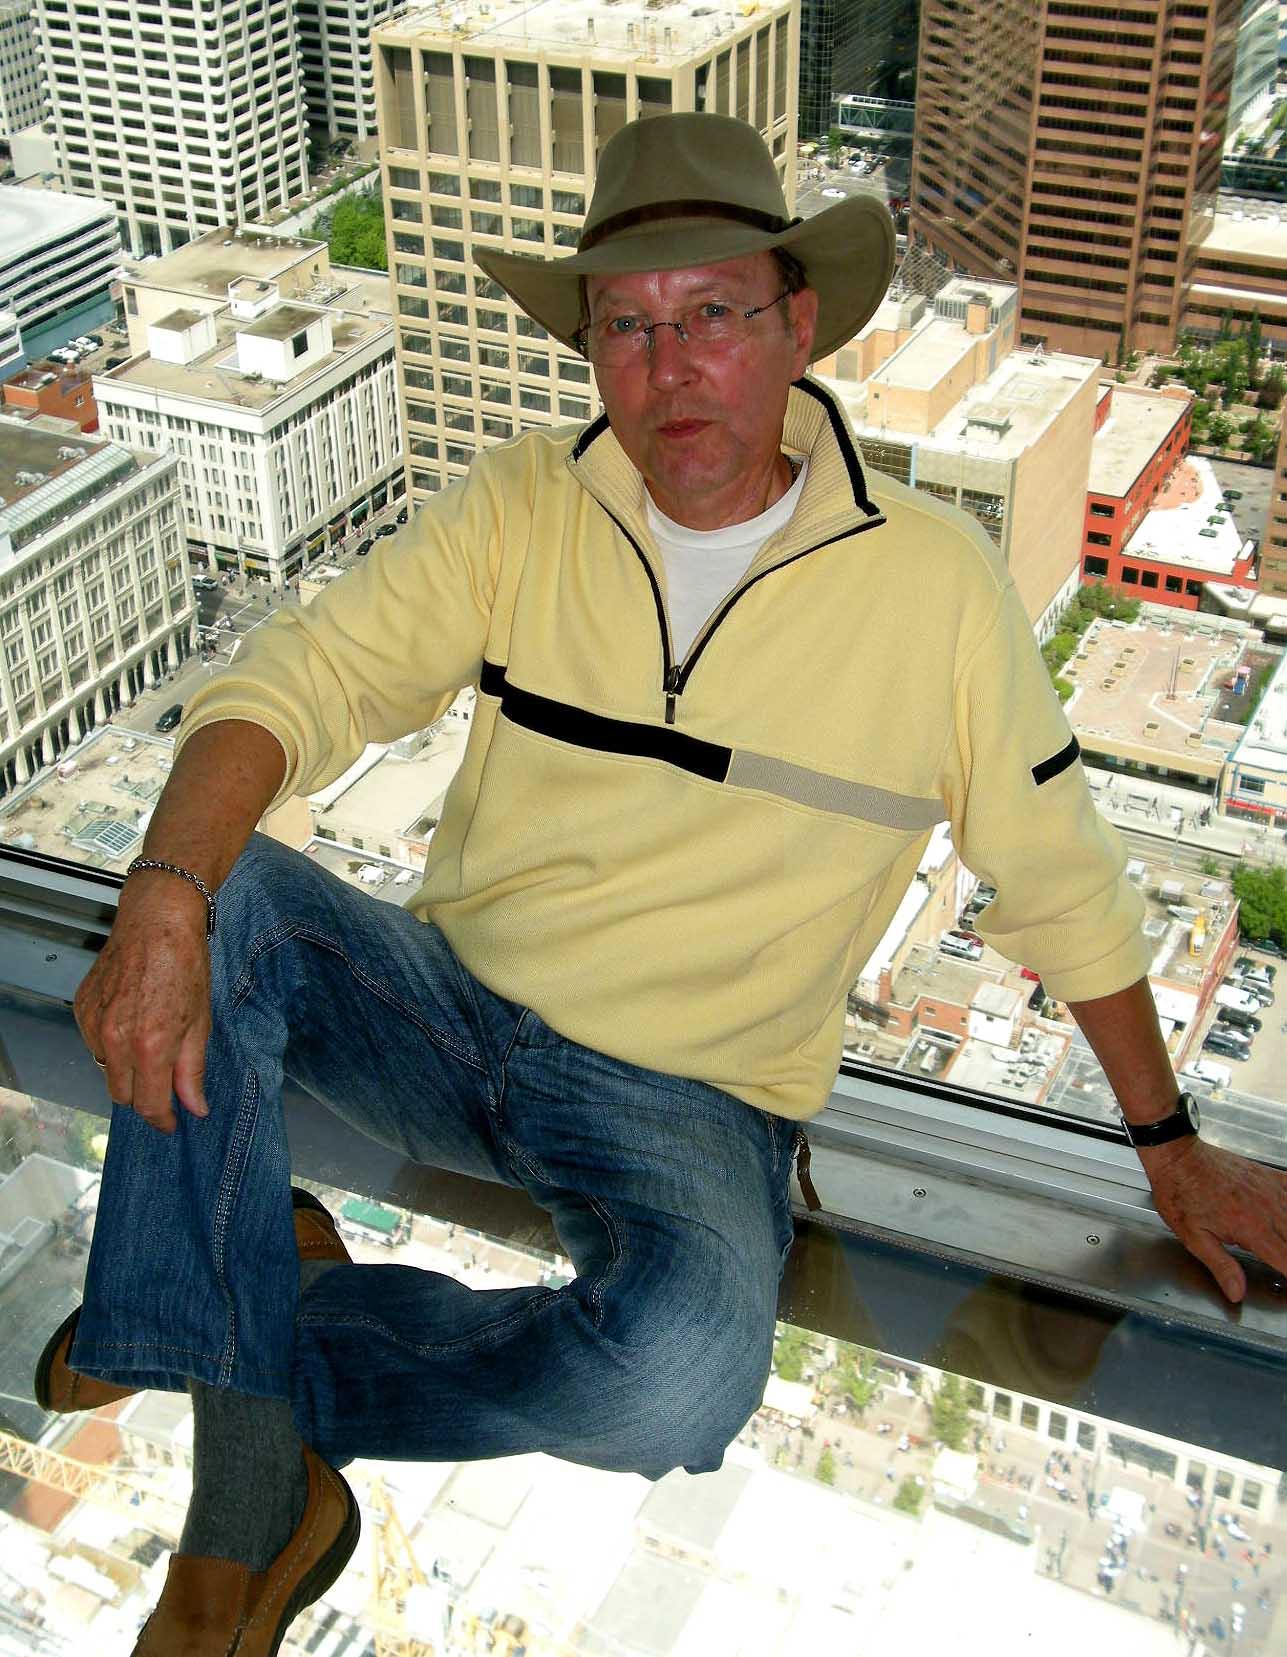 Juli 2009, Fernsehturm in Calgary